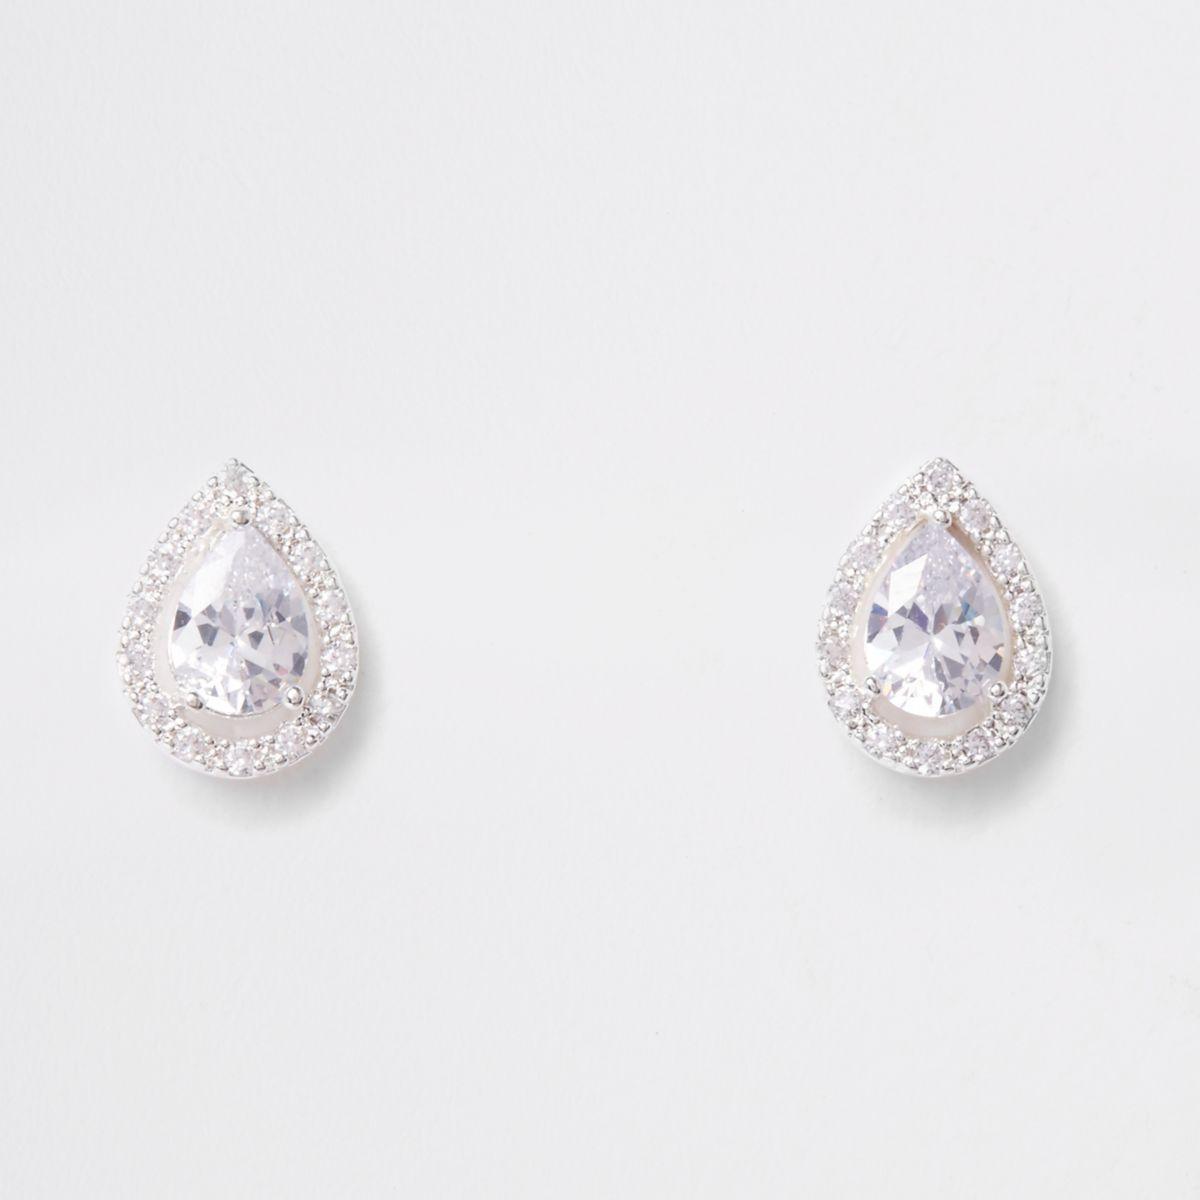 Sliver cubic zirconia teardrop stud earrings